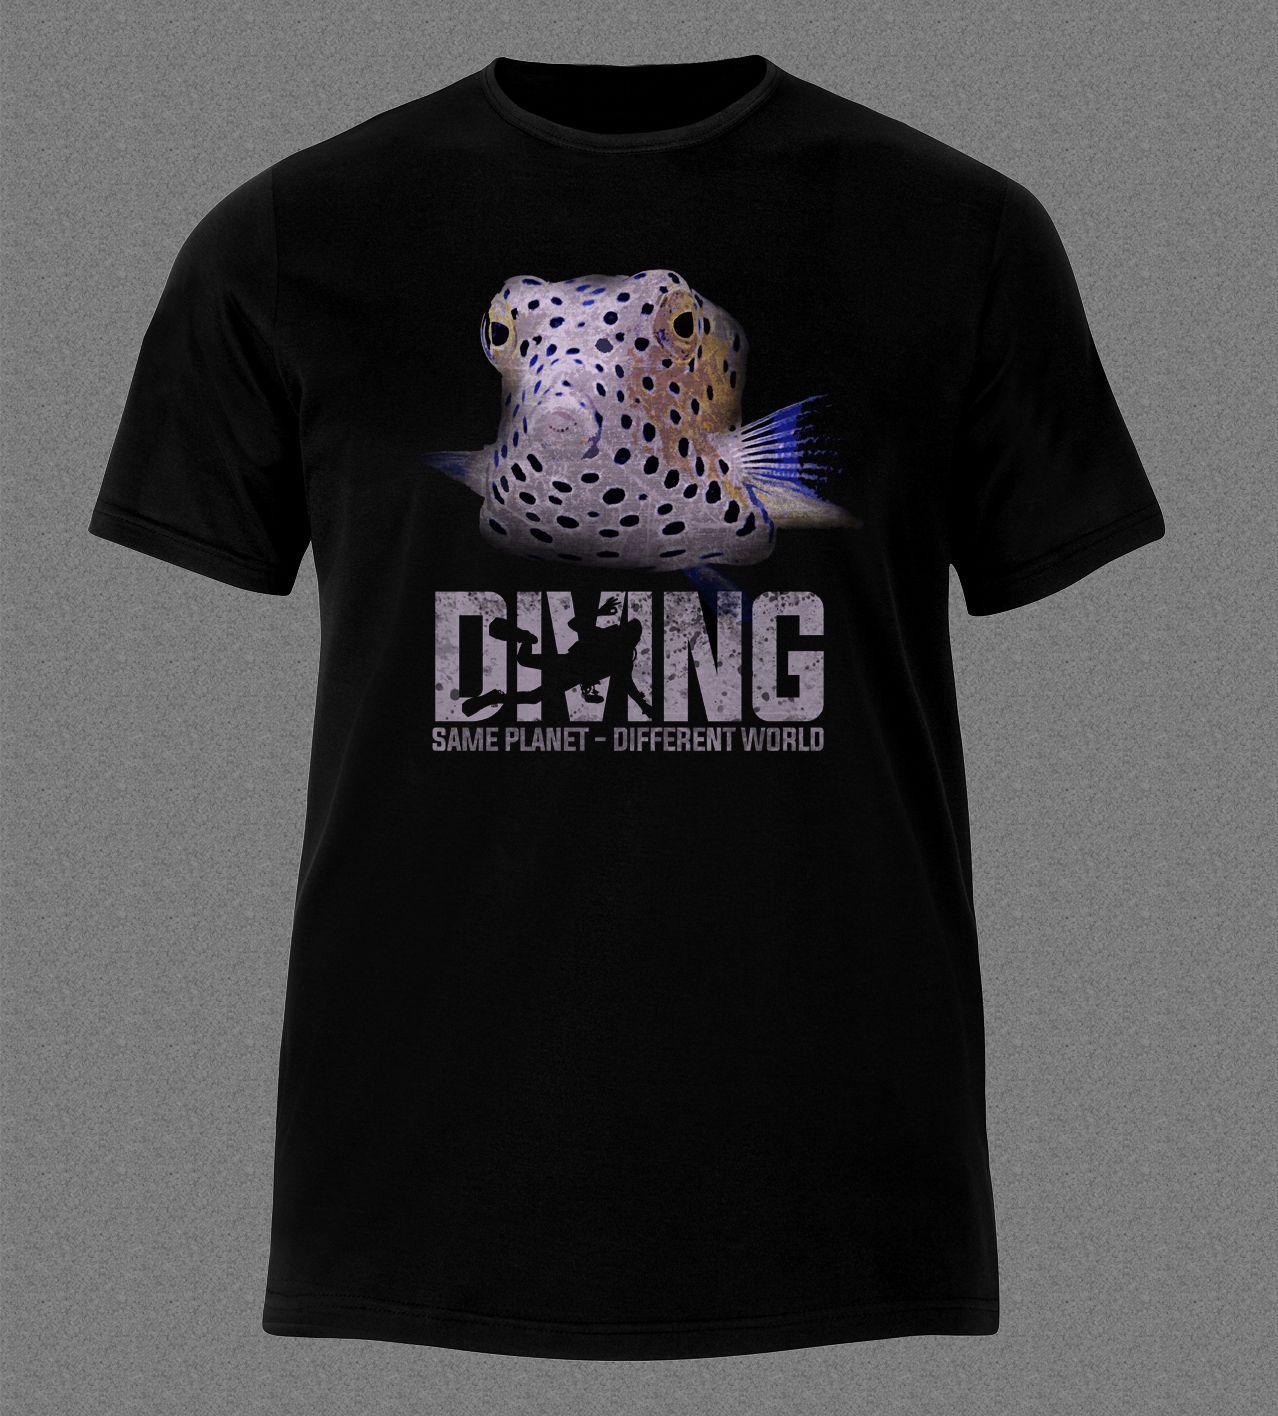 info for 097a4 703f0 Cheap Price 100 % Cotton Tee Shirts BOX FISH DIVER GEAR SCUBA OCEAN SEA  T-shirt stephen curry jersey